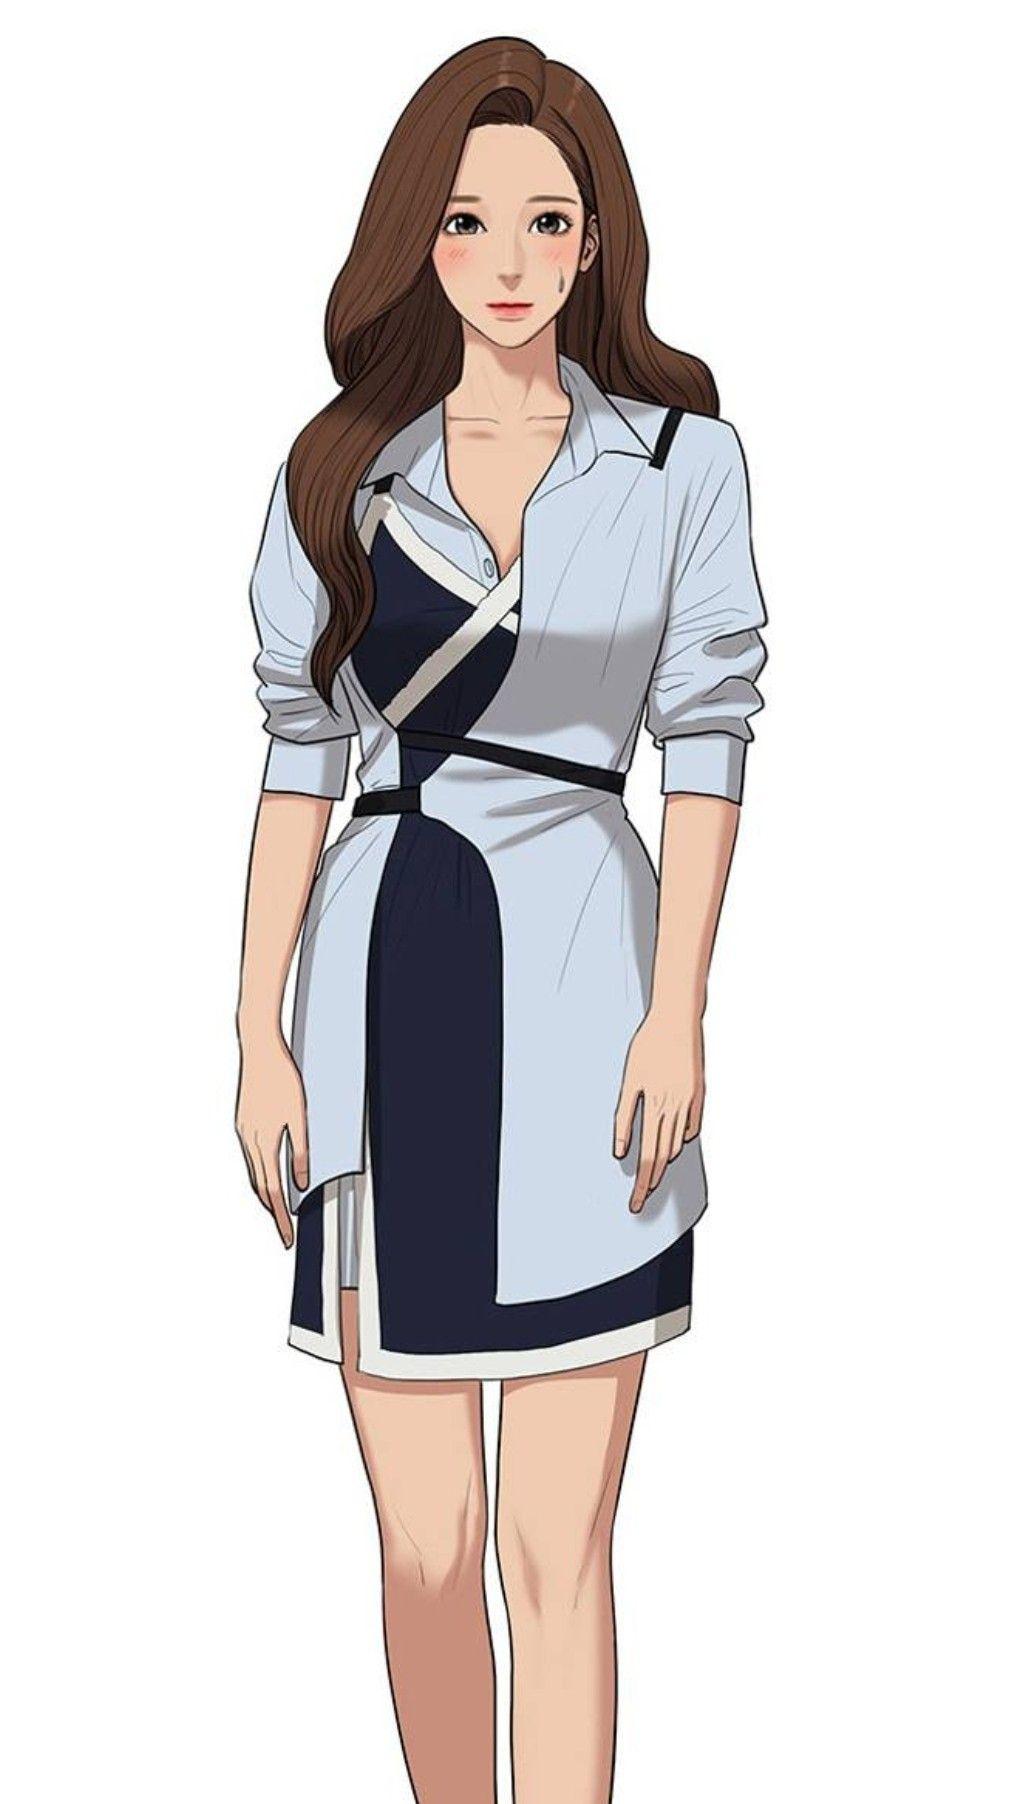 PREETTTYYY 😍😍 Model pakaian, Sketsa model pakaian, Anime